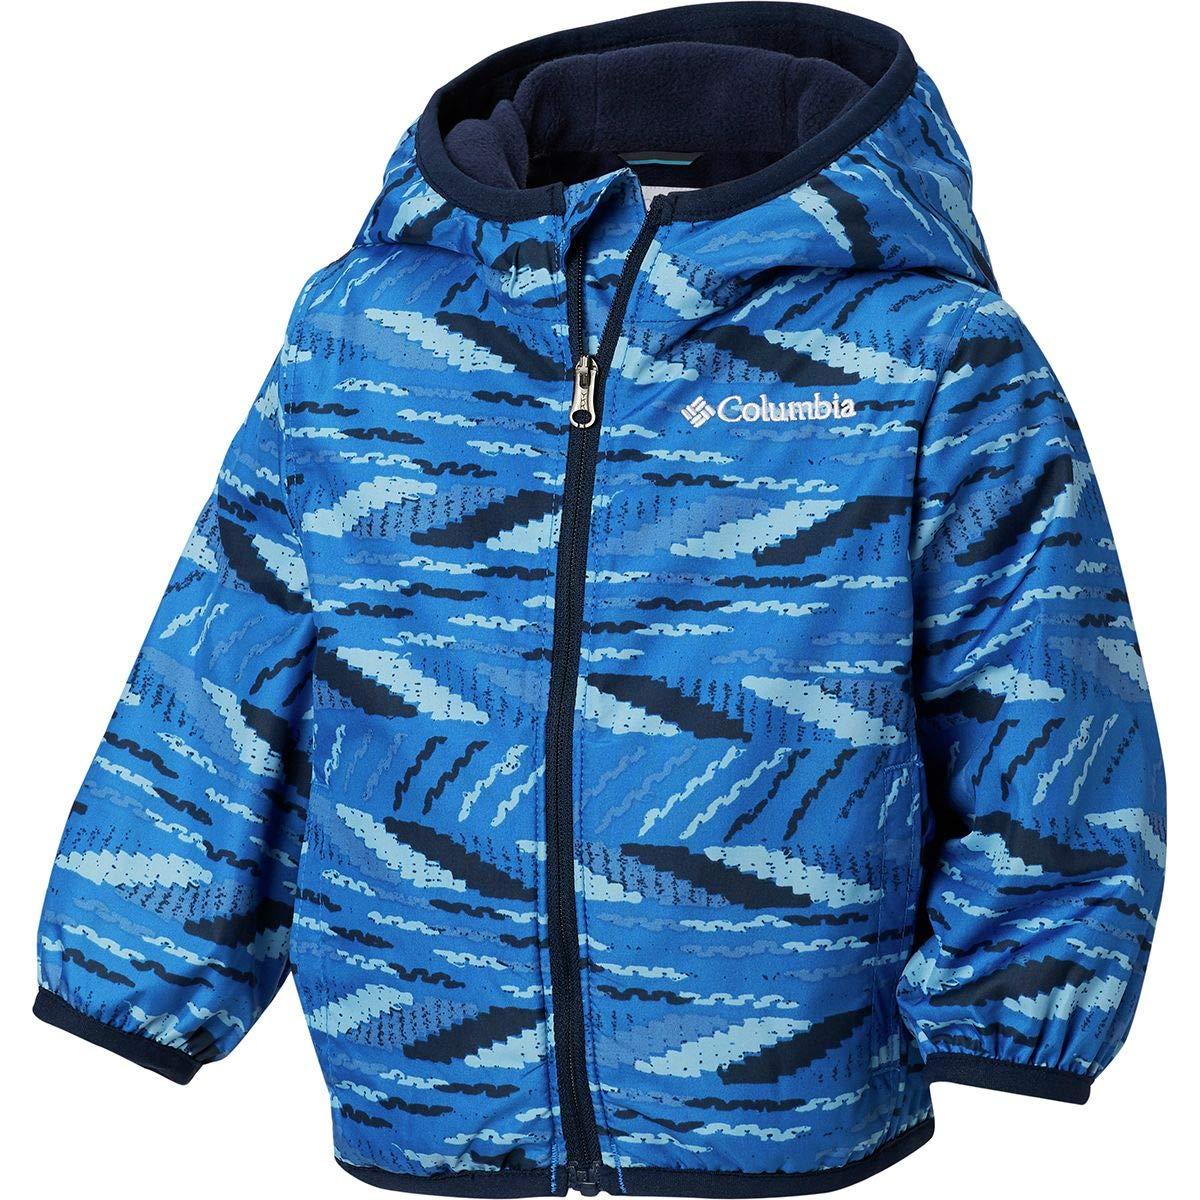 Columbia Kids Baby Boy's Mini Pixel Grabber¿ II Wind Jacket (Infant/Toddler) Super Blue Beach Stripe 18-24 Months